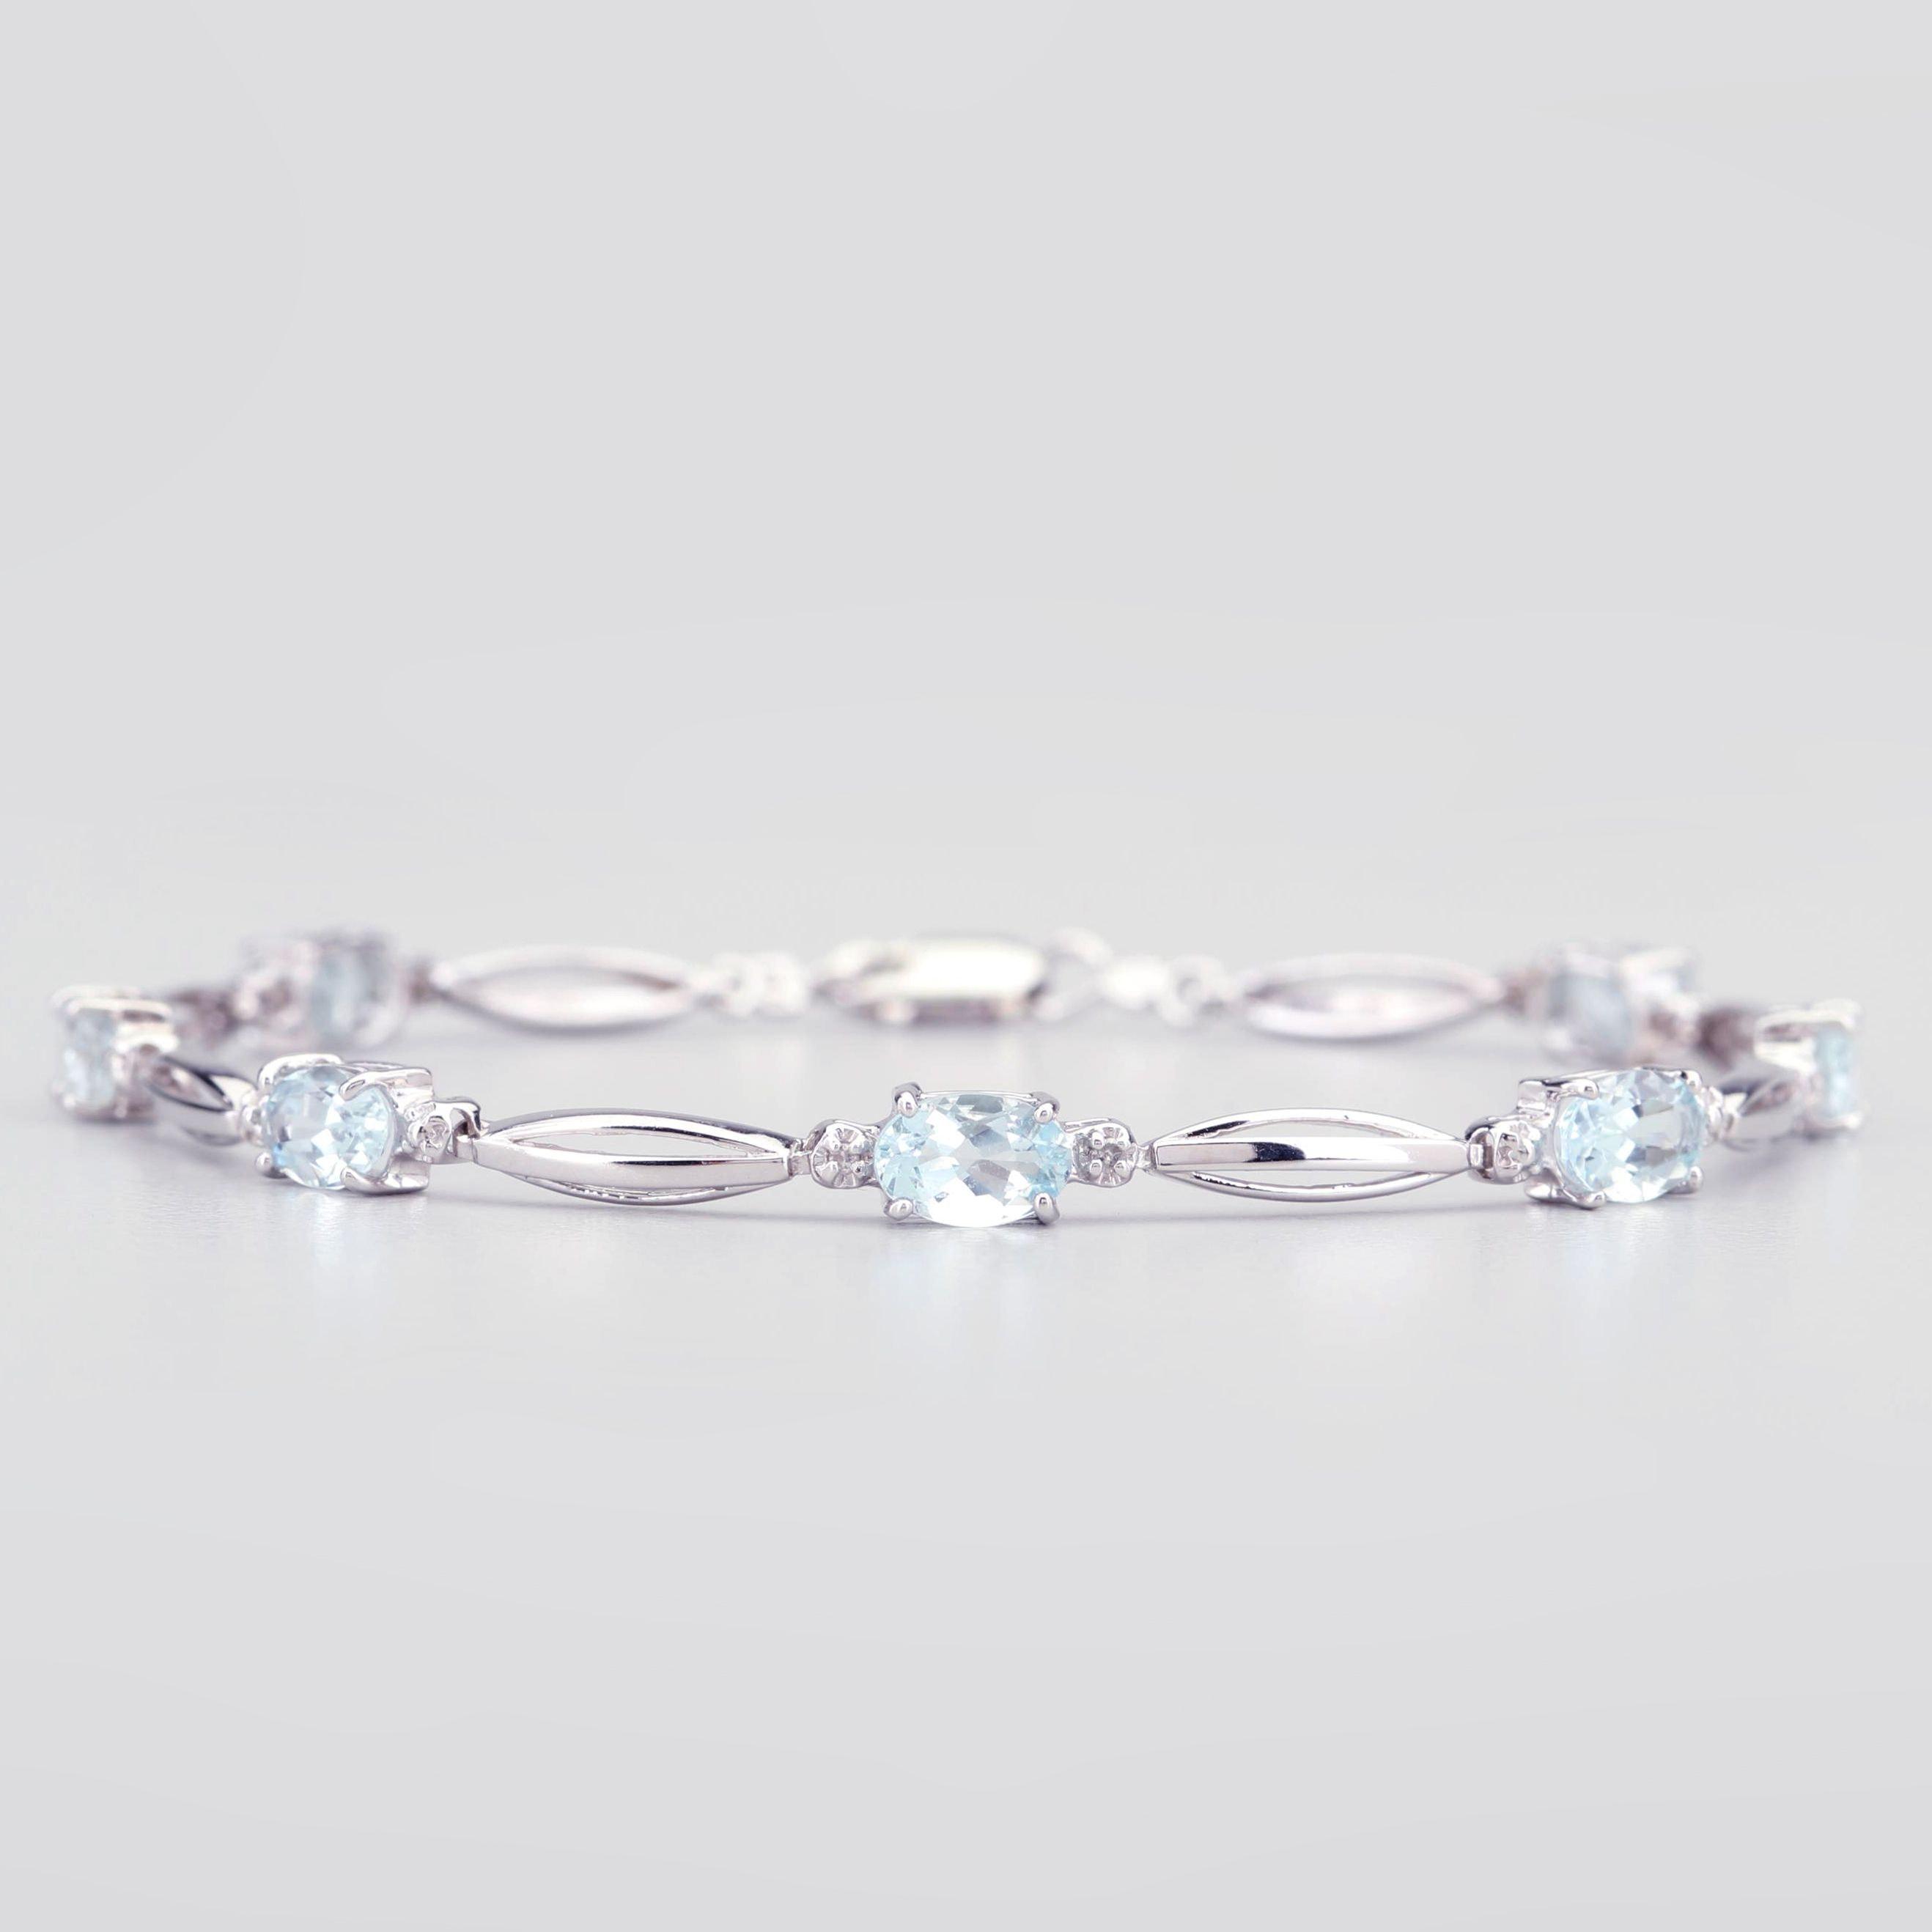 14K White Gold 2.82 CTW Aquamarine Bracelet